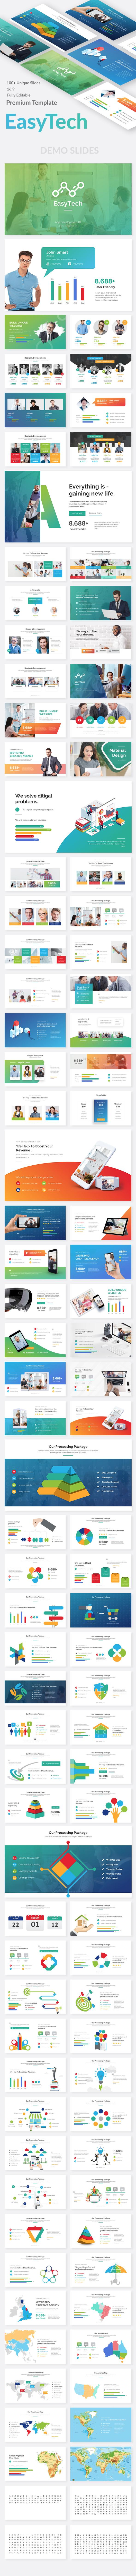 EasyTech Multipurpose Business Powerpoint Template - Business PowerPoint Templates